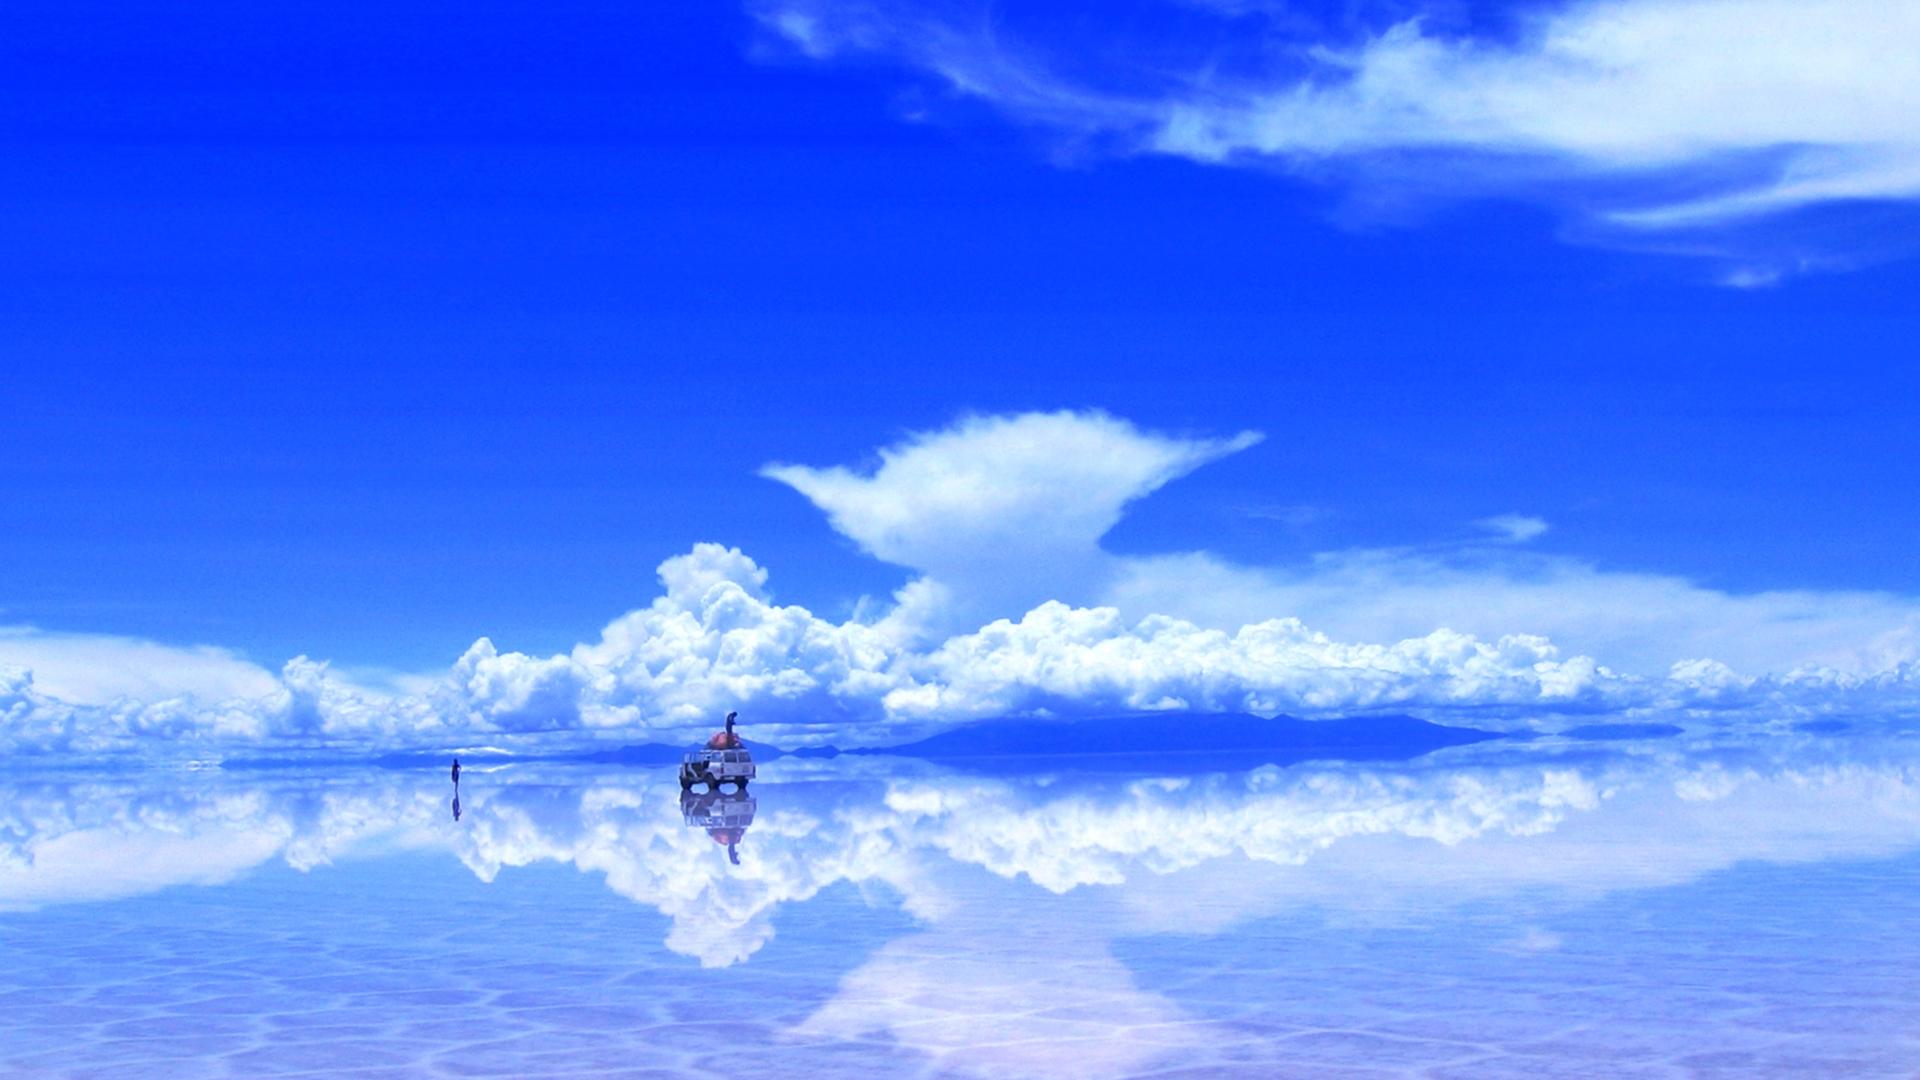 uyuni-solt-lake_triming-version28master-is-doublec008_blogspot_jp29-1.jpg